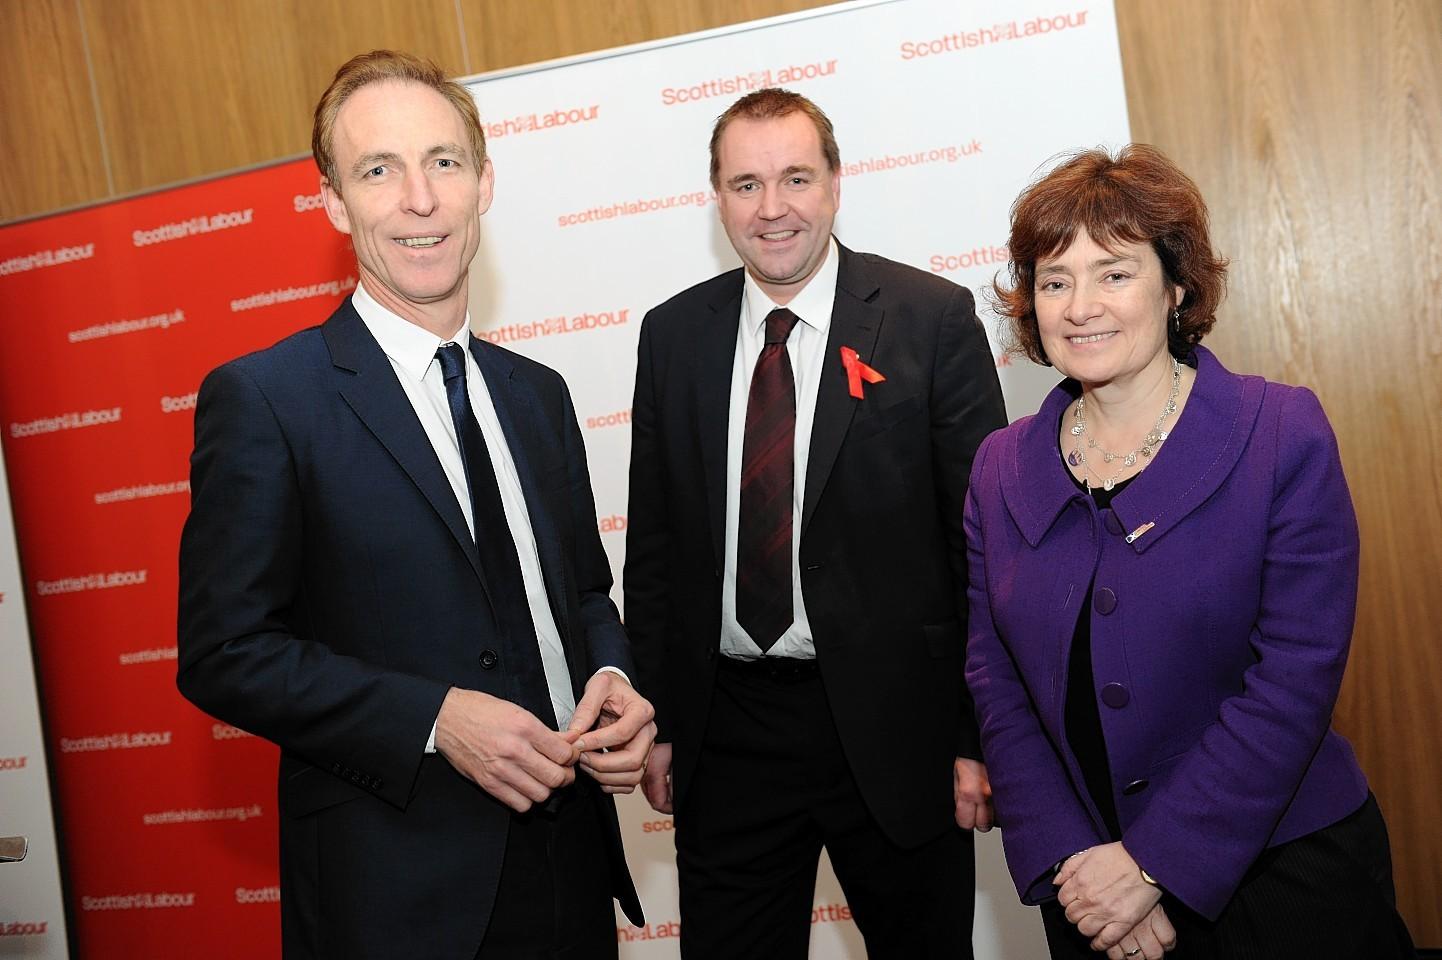 Jim Murphy, Neil Findlay and Sarah Boyack last night.